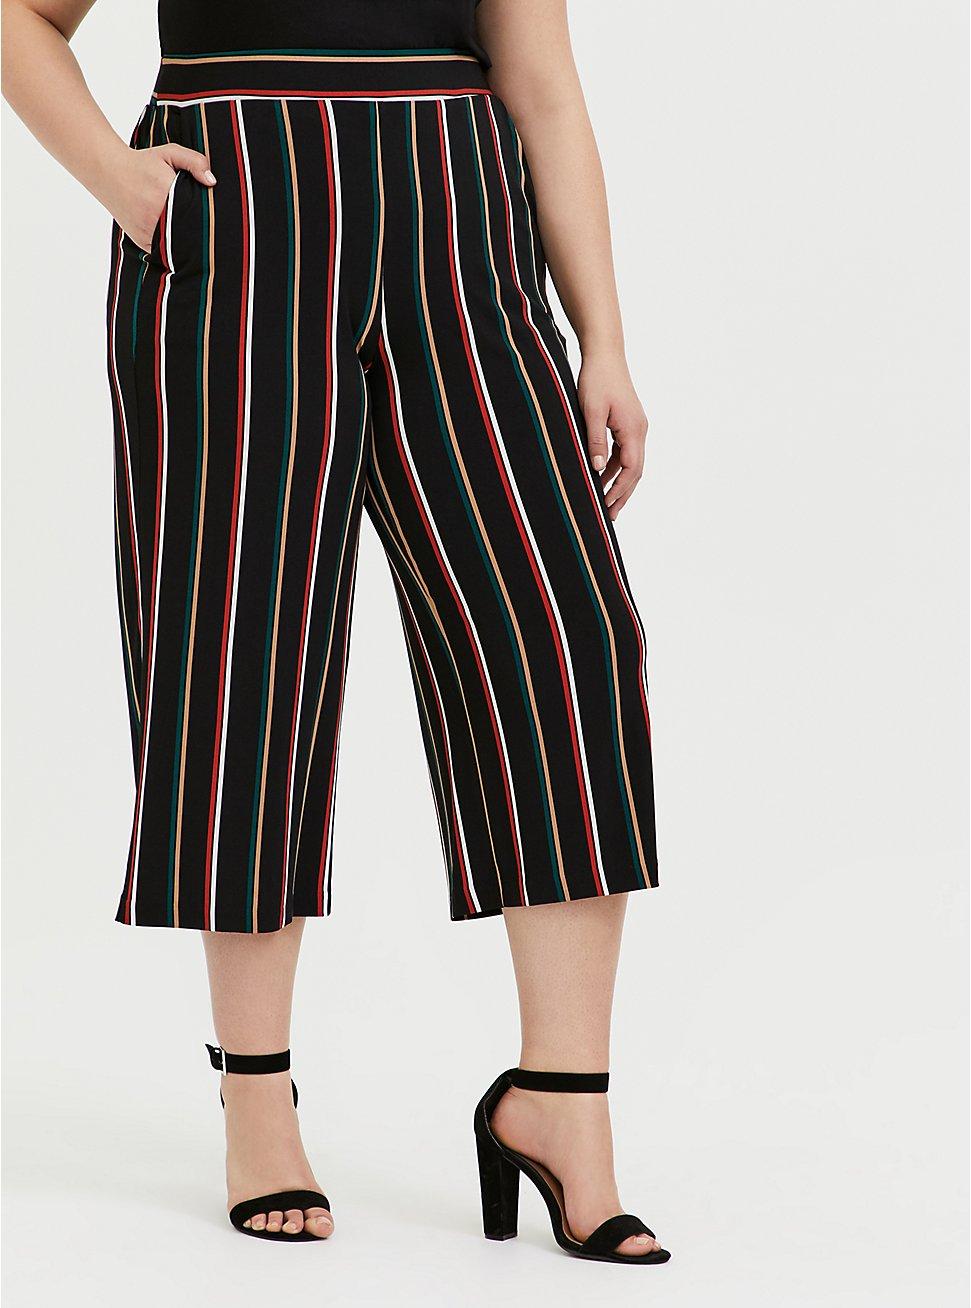 Black Multi Stripe Studio Knit Culotte Pant, STRIPES, hi-res